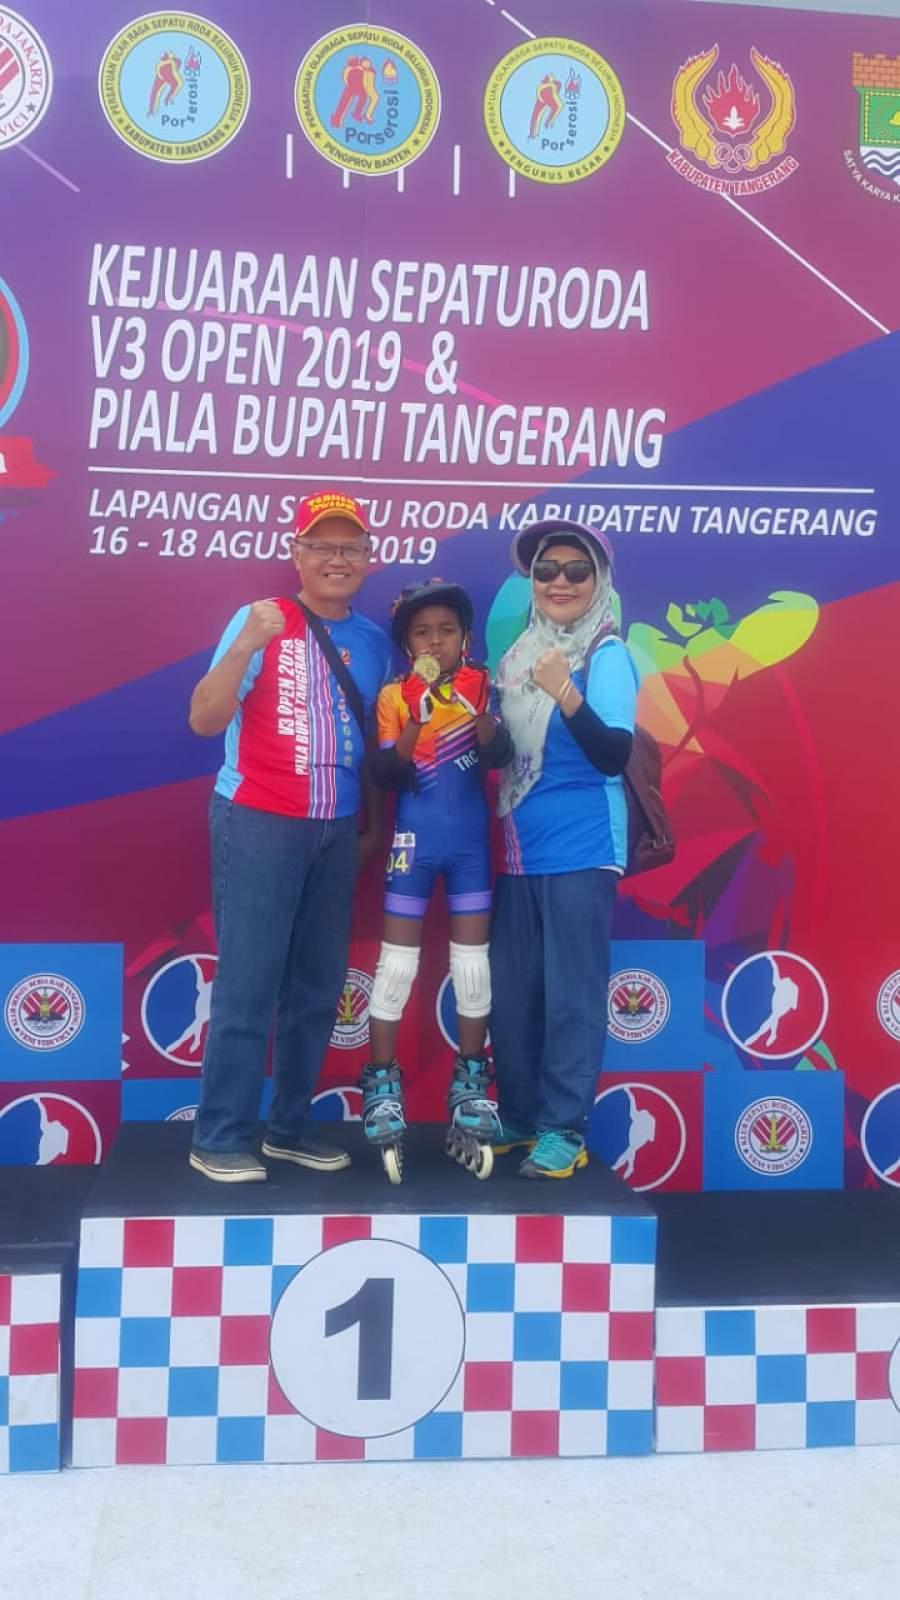 Turnamen Internasional, Atlit Sepatu Roda Cilik Asal Tangerang Sabet Medali Emas